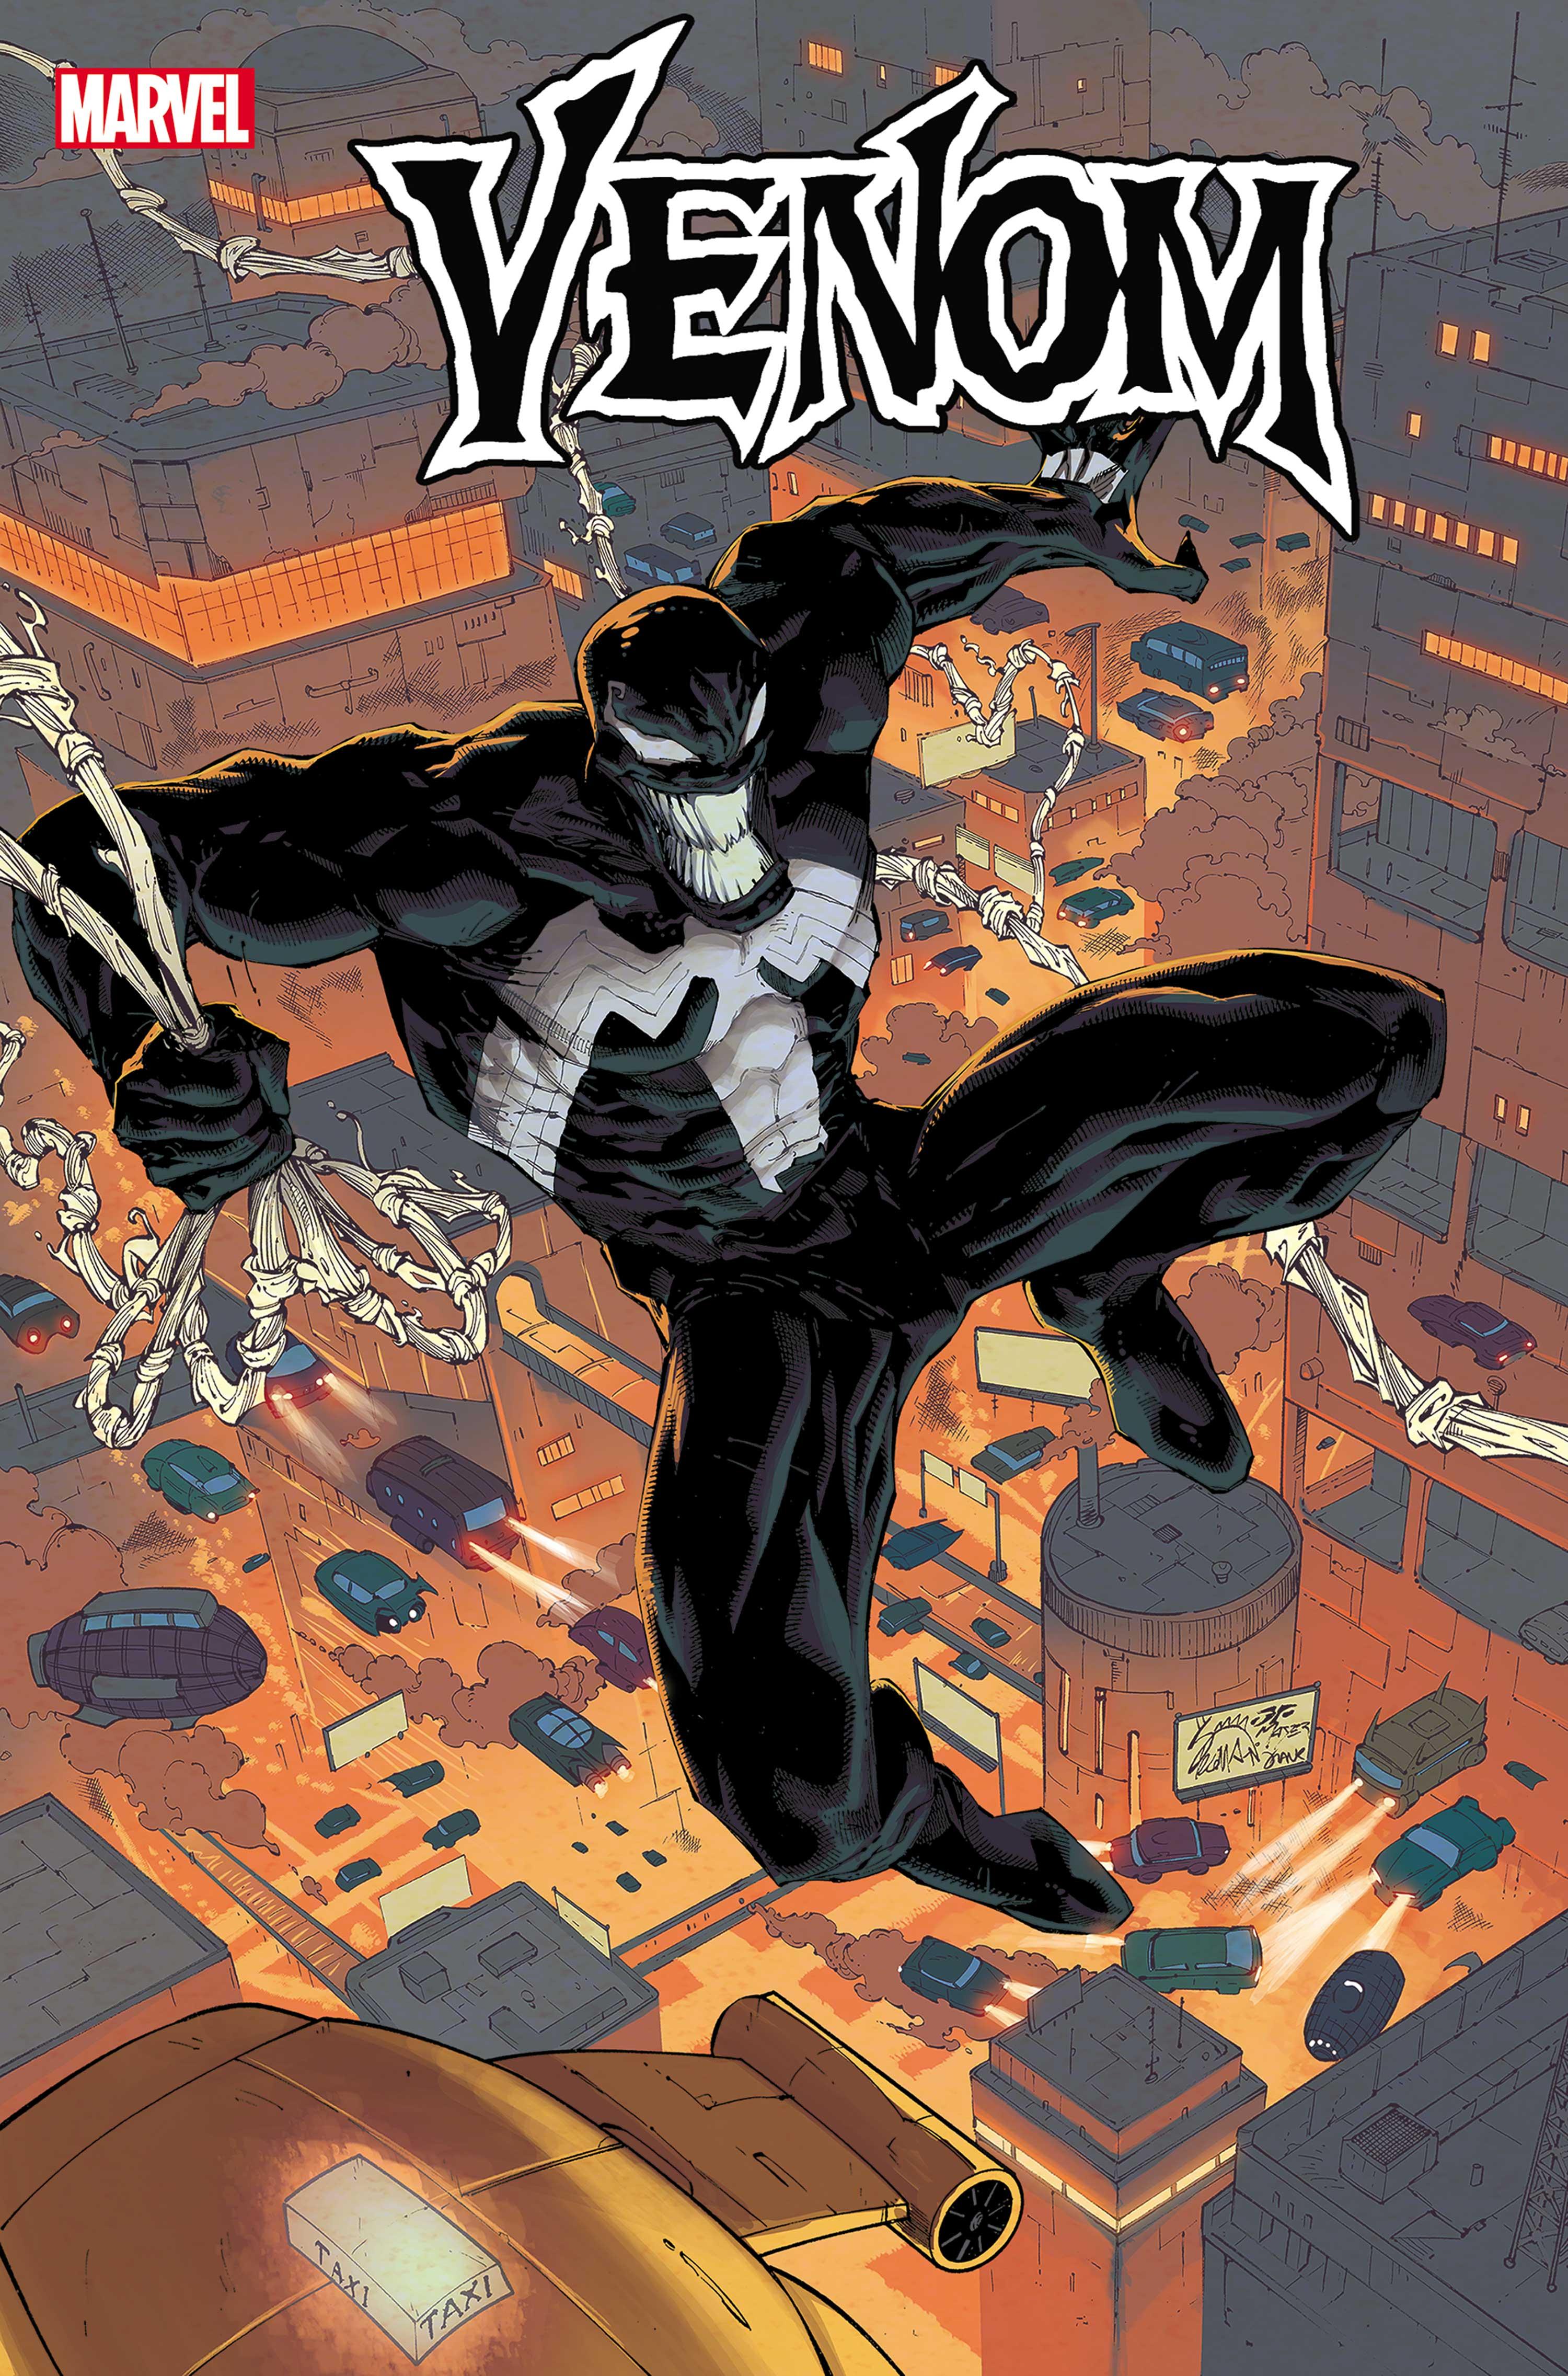 Venom (2018) #27